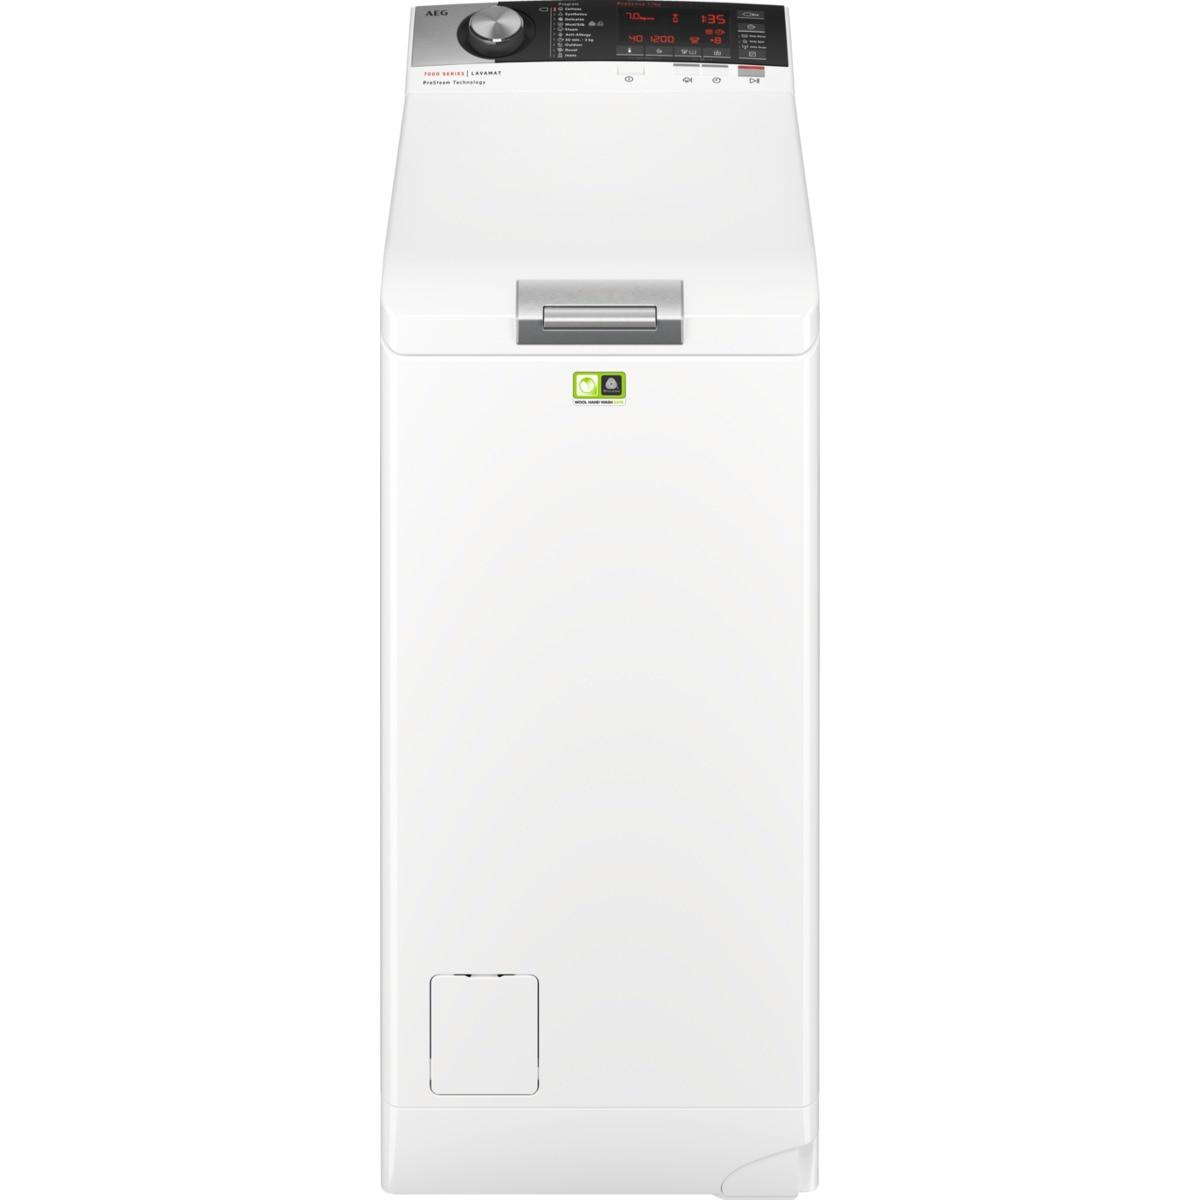 Fotografie Masina de spalat rufe cu incarcare verticala AEG LTX7C373E, 7 kg, 1300 RPM, Tehnologie ProSteam, Motor Inverter, Display LCD, Iluminare Tambur, Clasa A+++, Alb